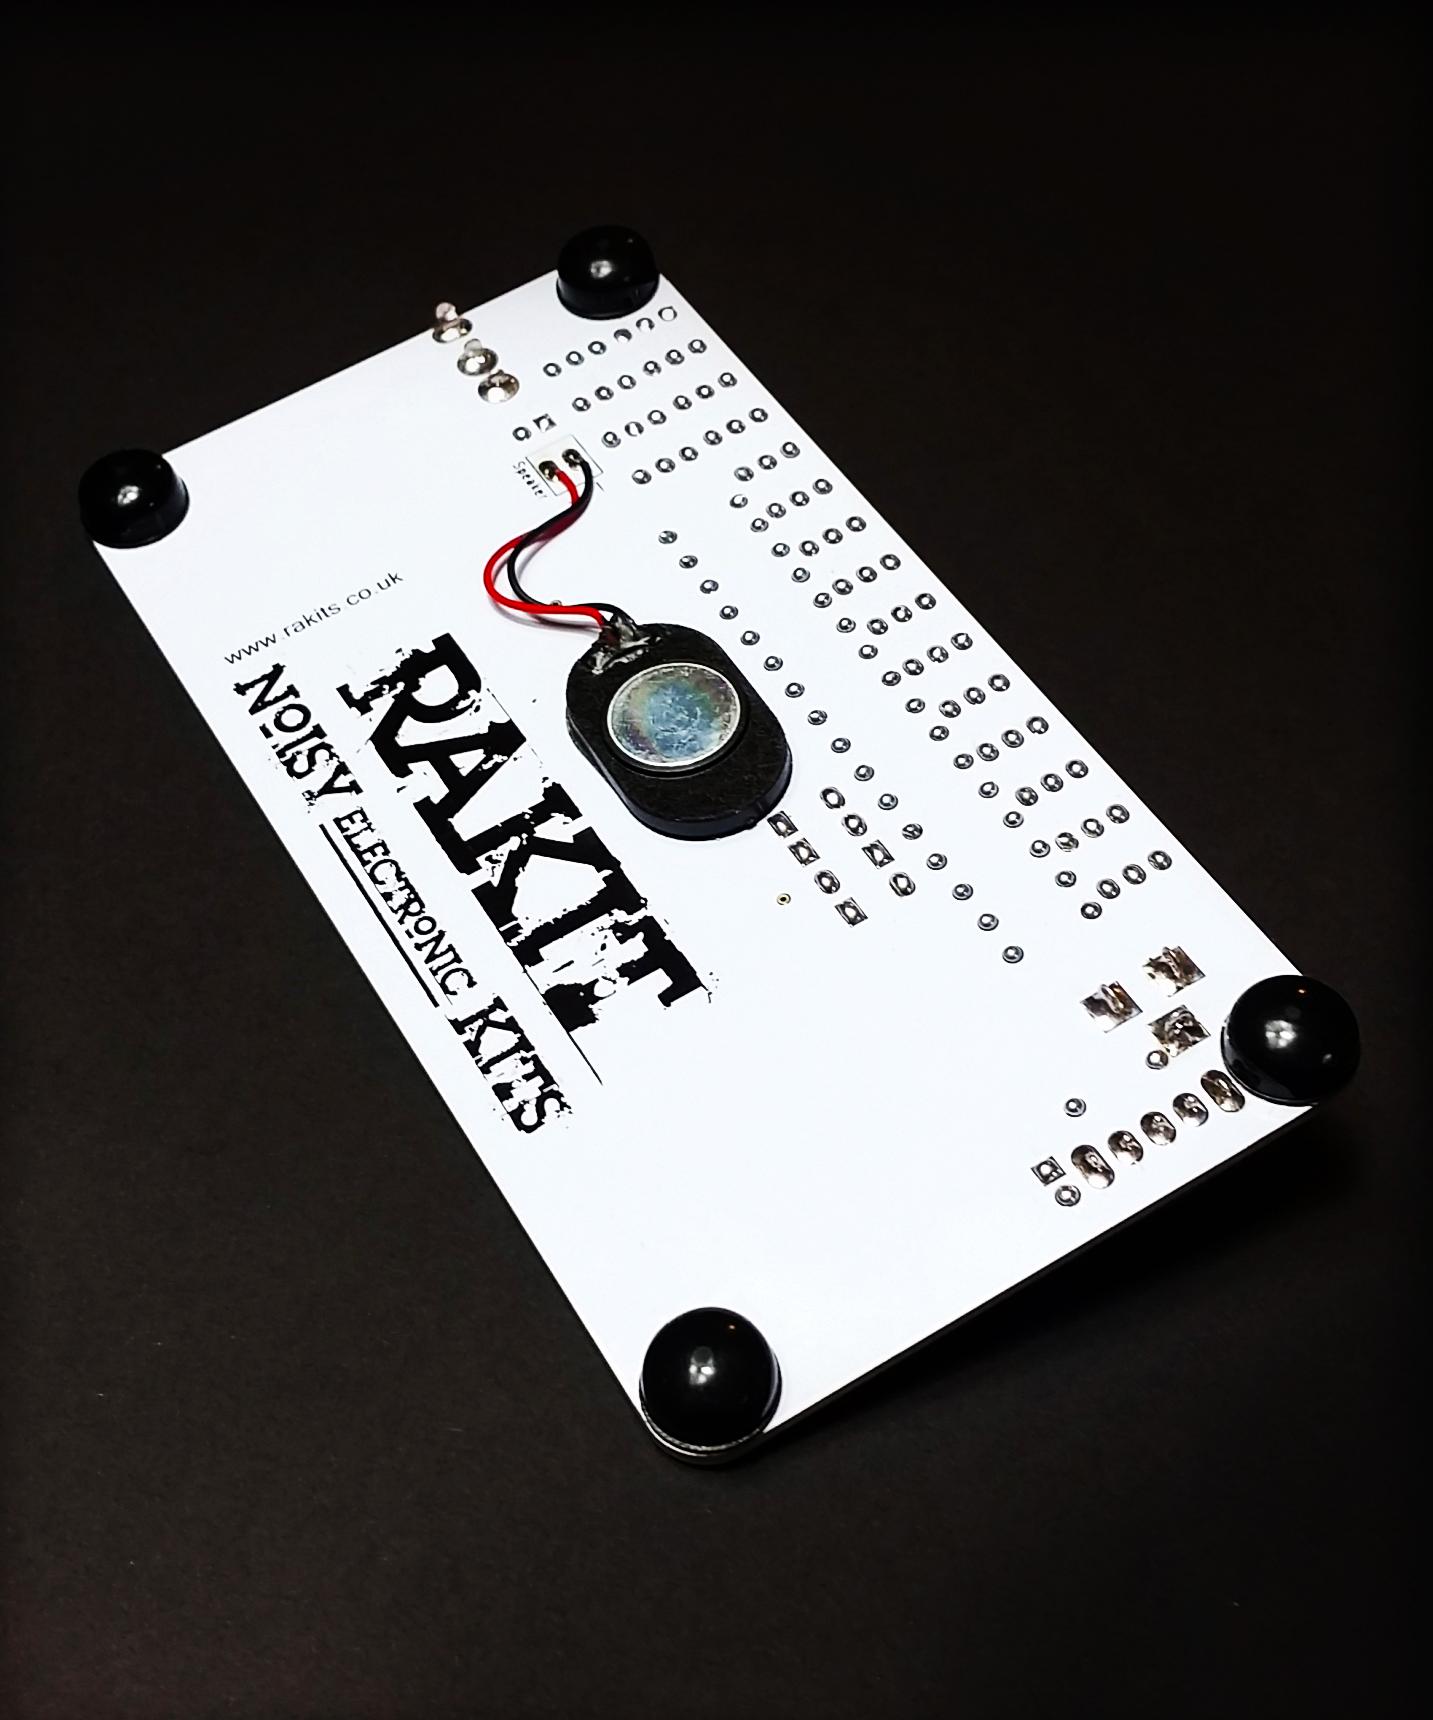 Disintegrated Cracklebox Kit Rakit Electronic Circuit Kits For Adults Uk